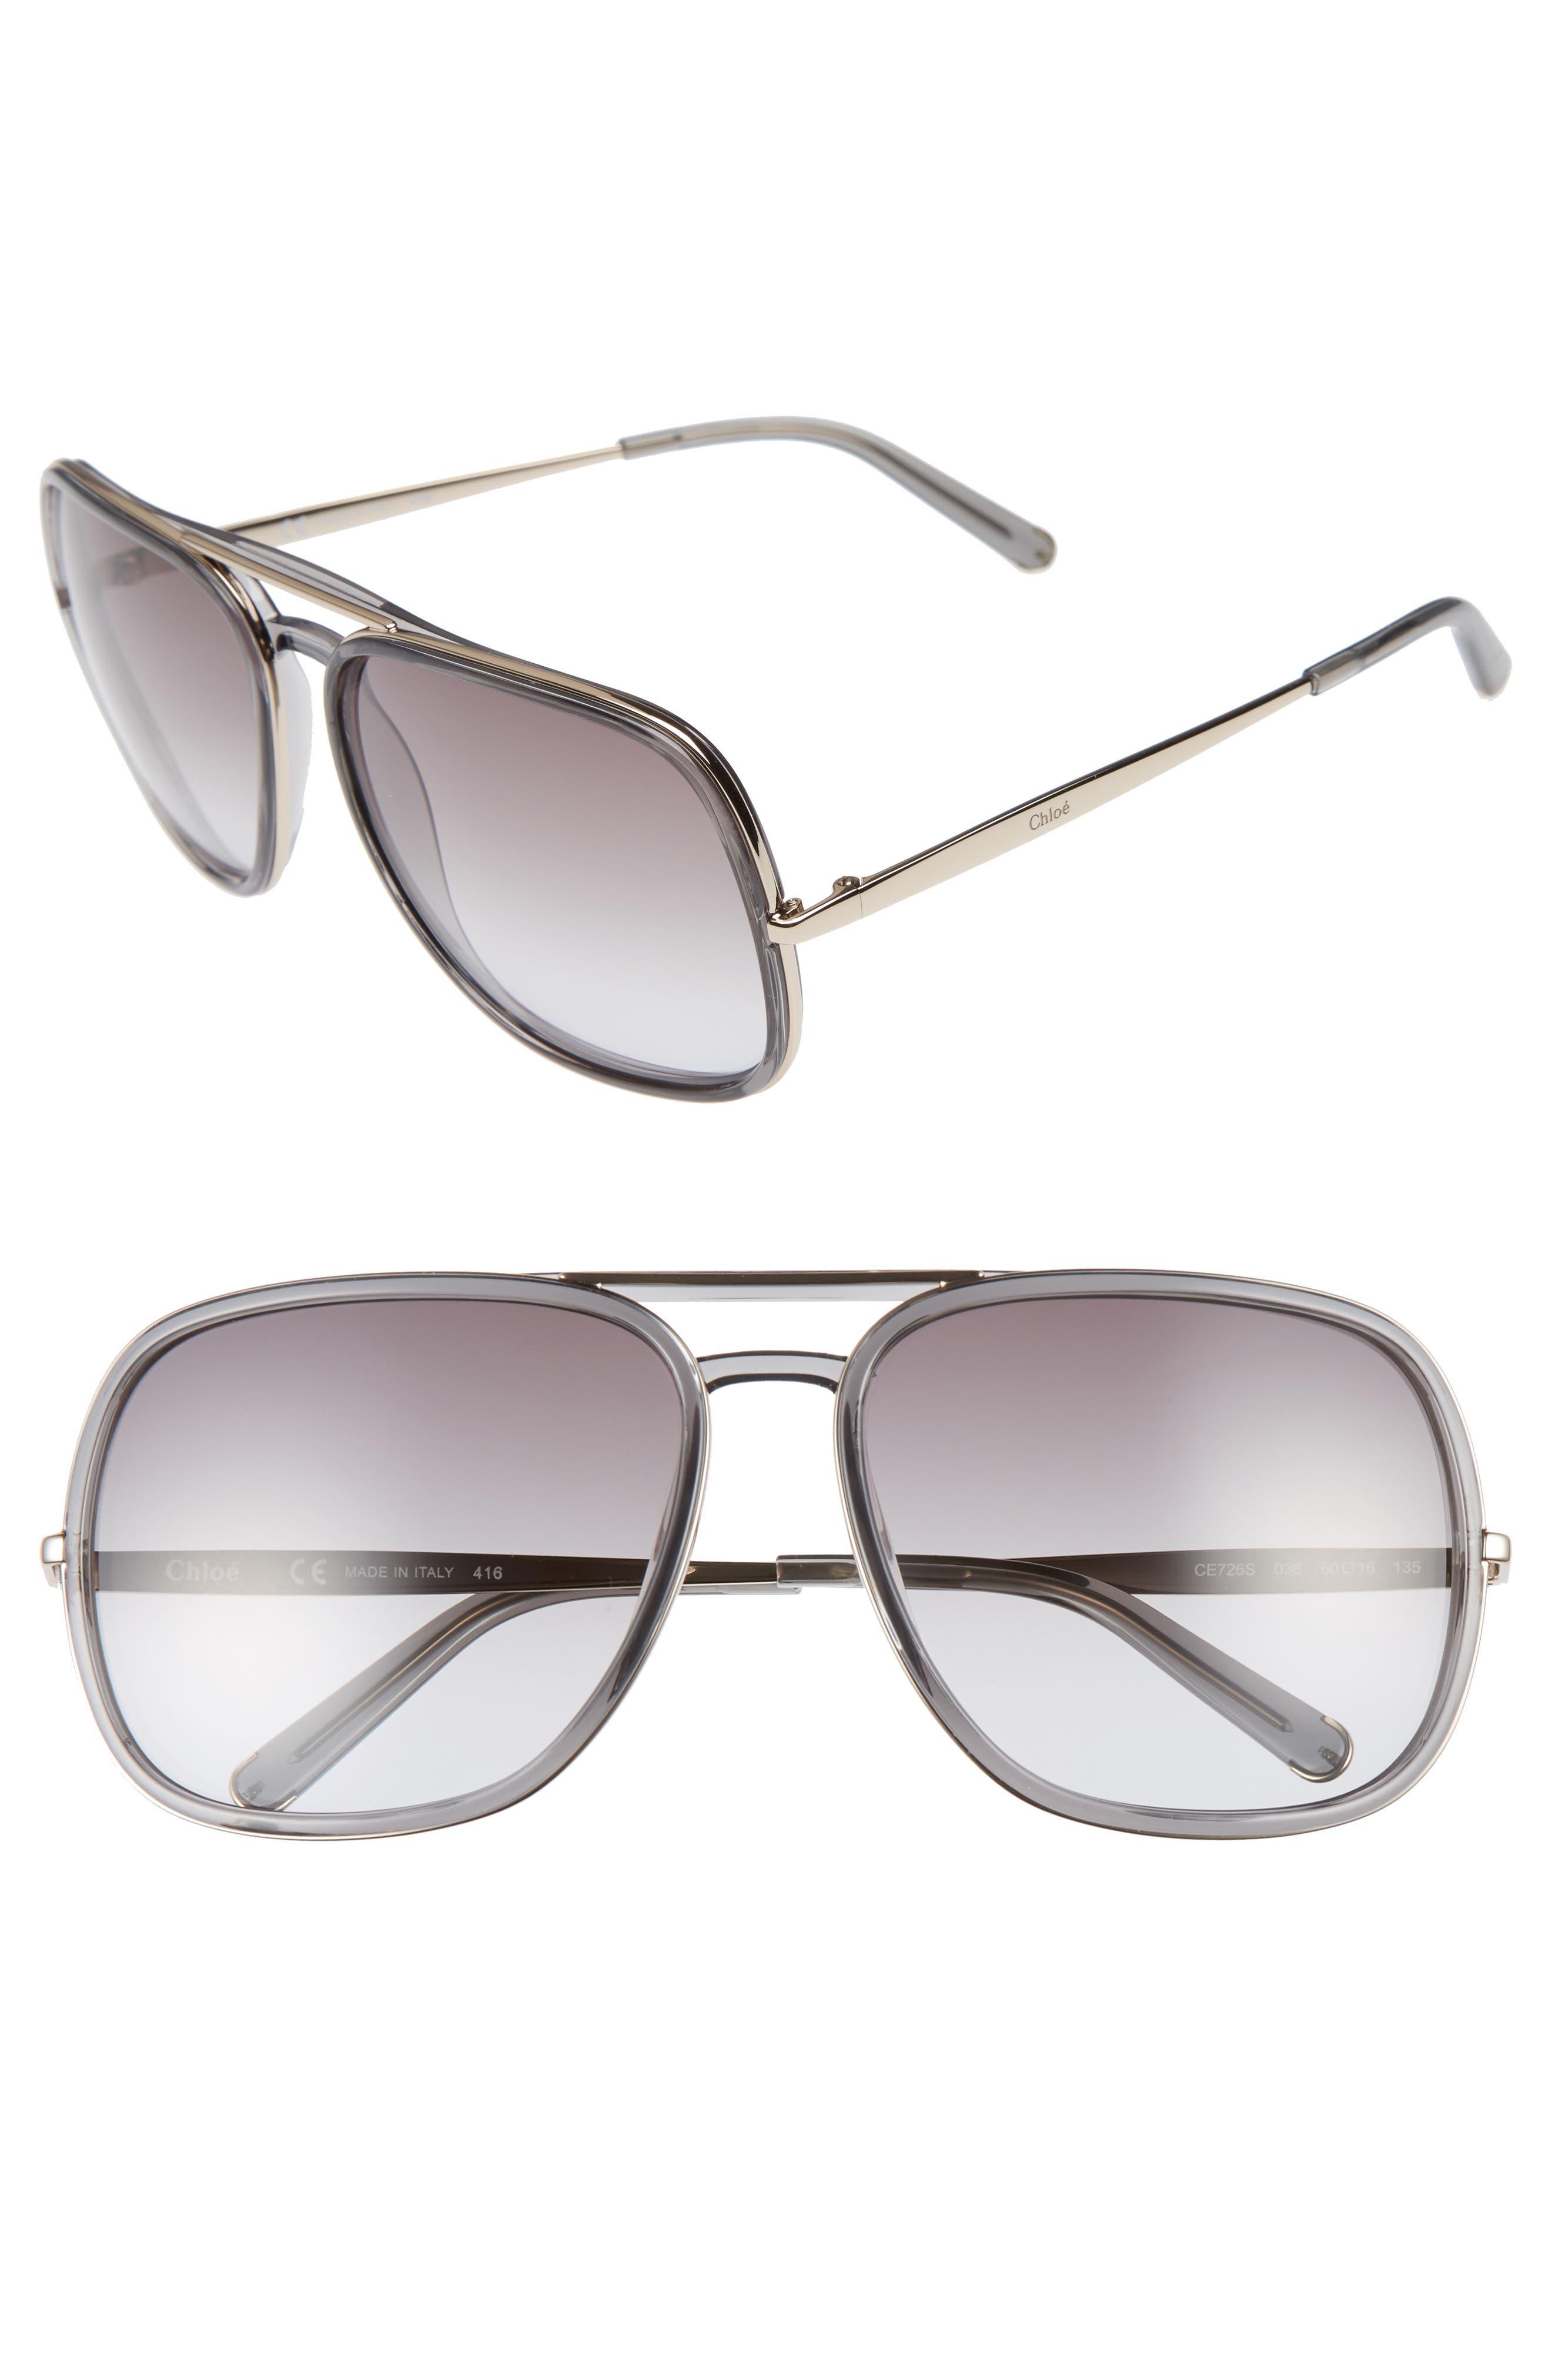 60mm Gradient Lens Navigator Sunglasses,                             Main thumbnail 1, color,                             020